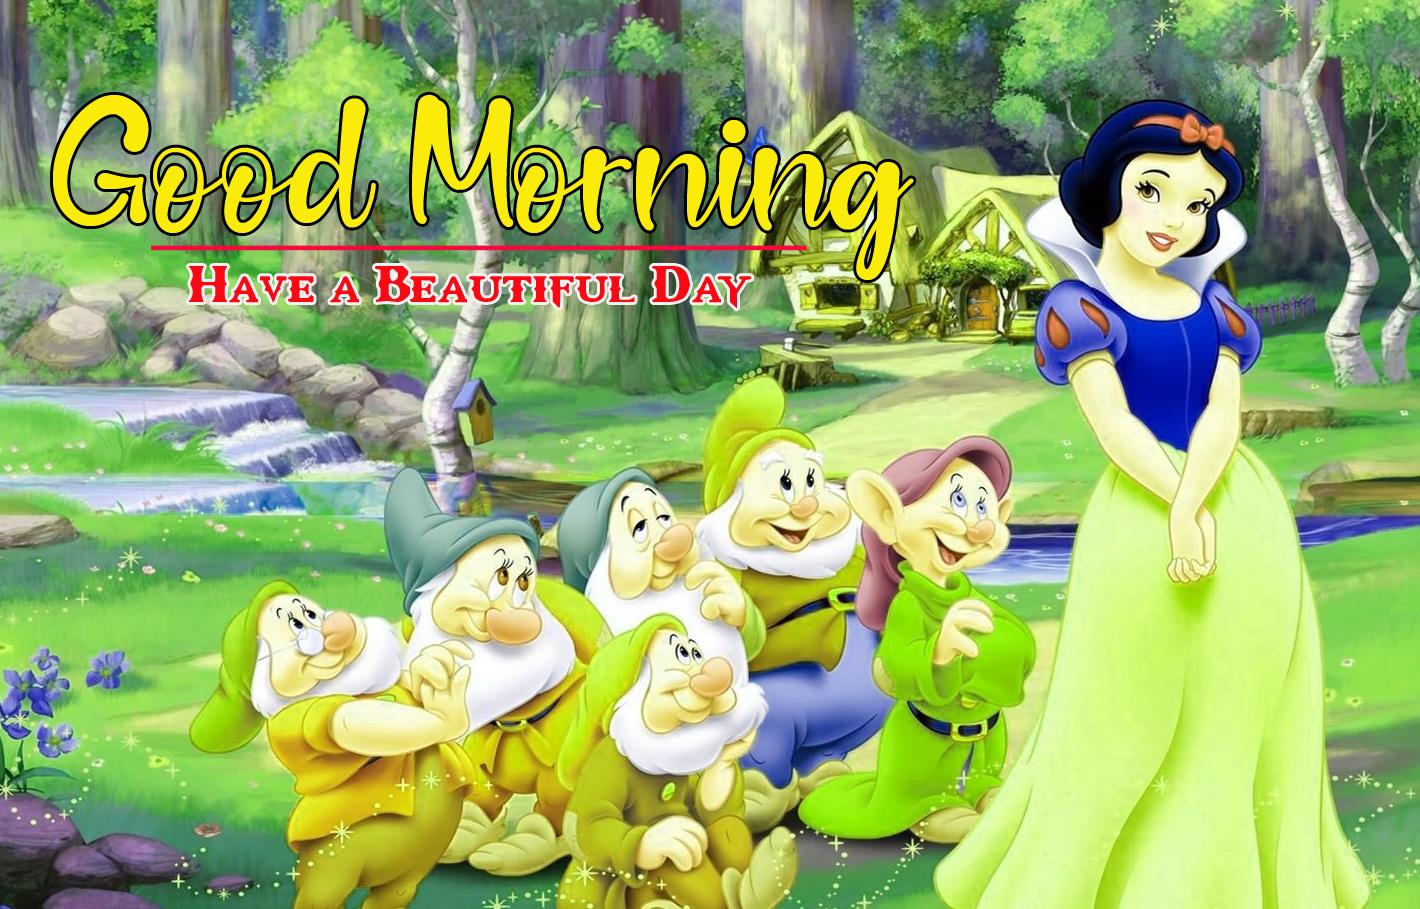 Cartoon Good Morning Images 5